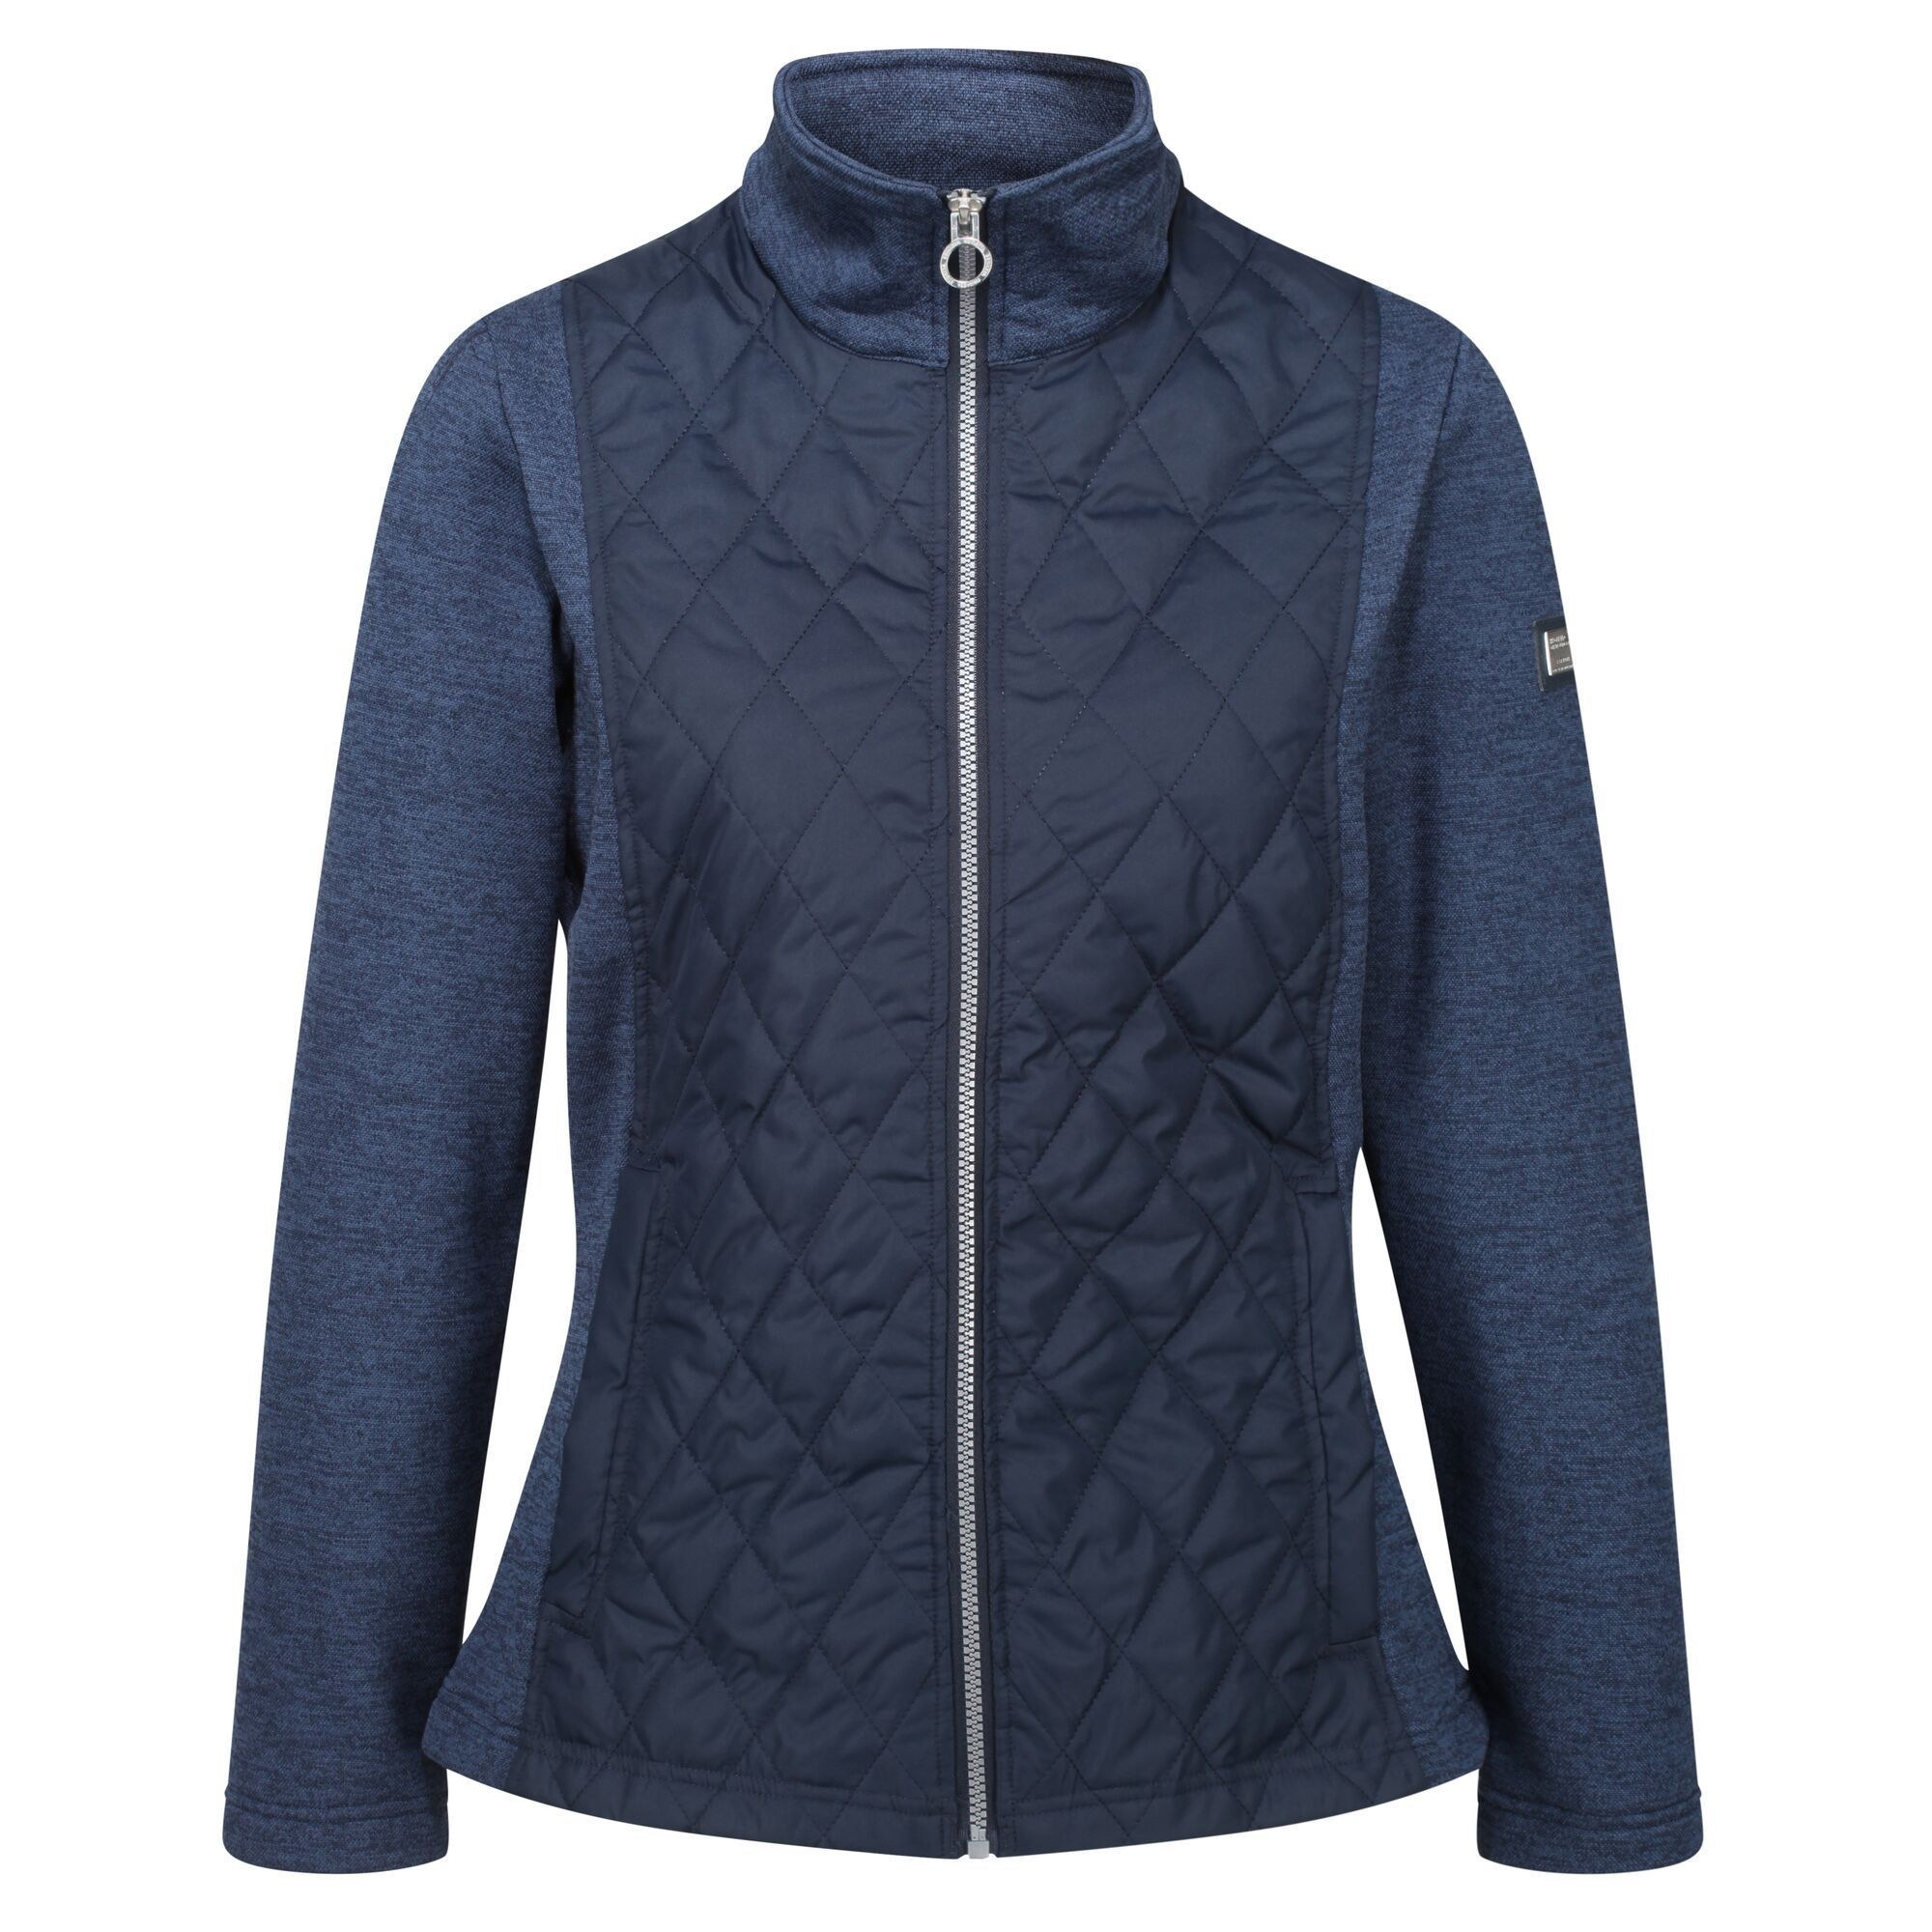 Regatta Womens/Ladies Zuzela Full Zip Fleece Jacket (Navy)